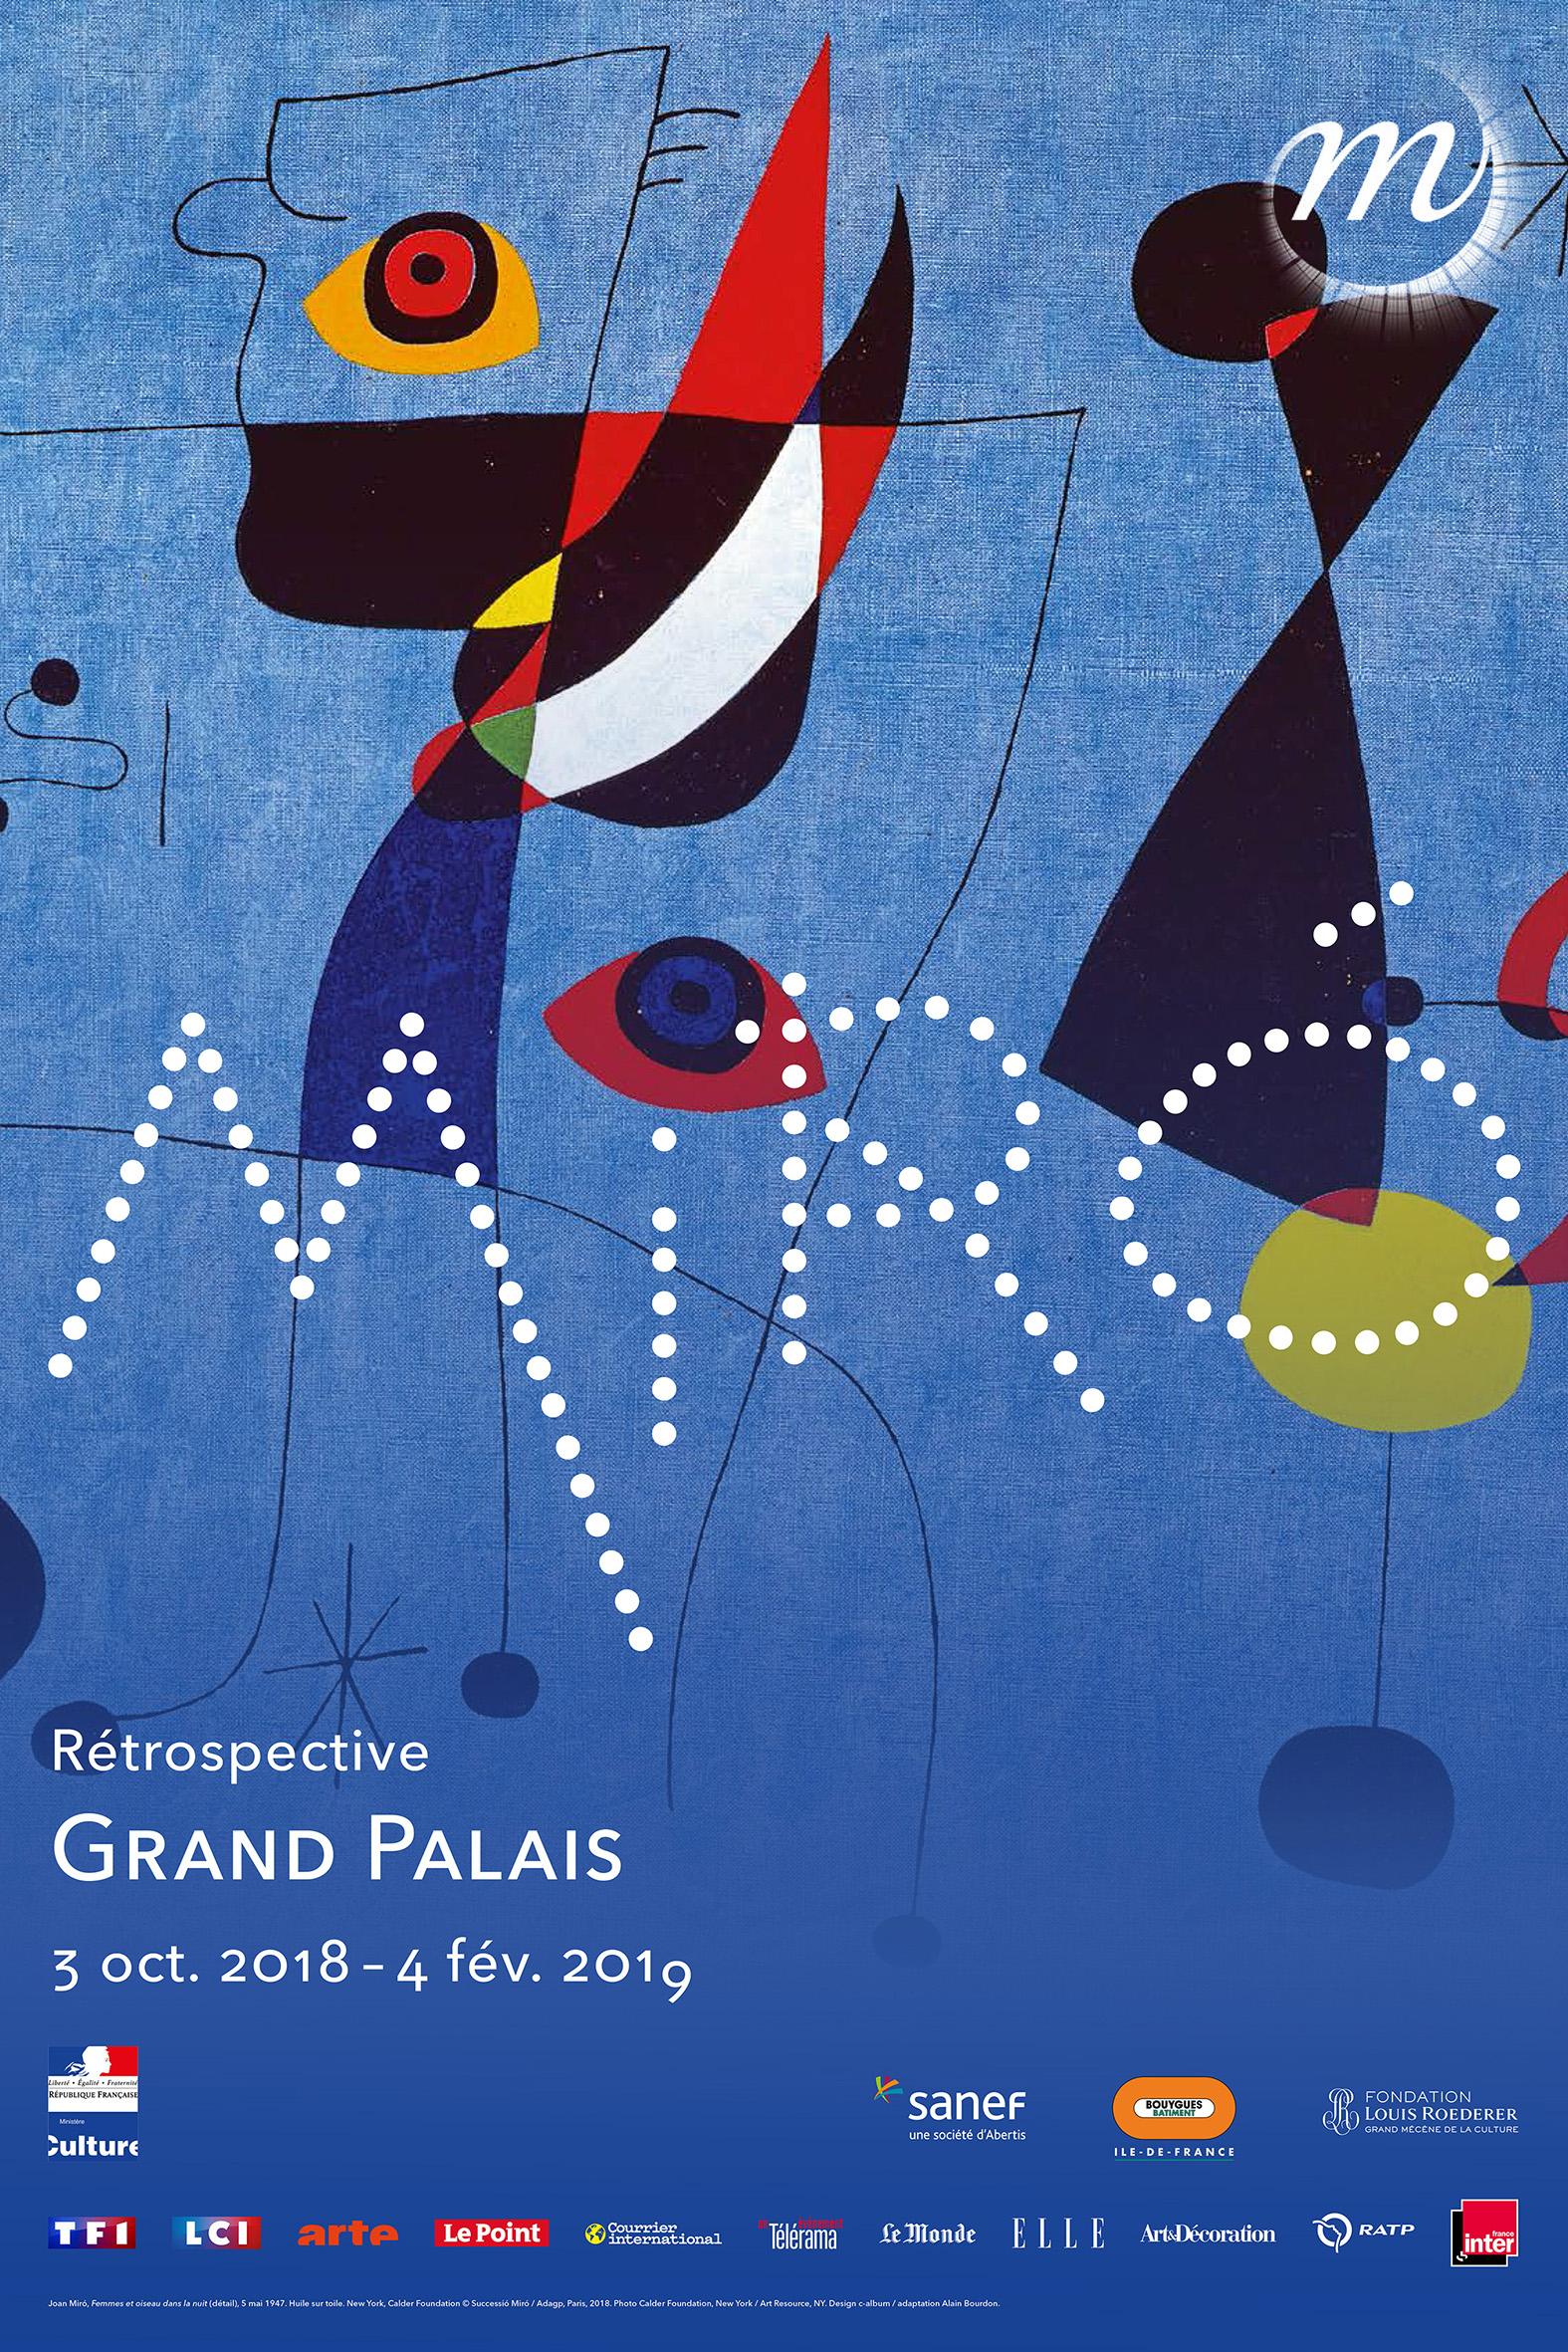 Miro Rétrospective Grand Palais © Successió Miró %252F Adagp%252C Paris 2018 Photo Calder Foundation%252C New York %252F Art Resource%252C NY Design c-album %252F adaptation Alain Bourdon